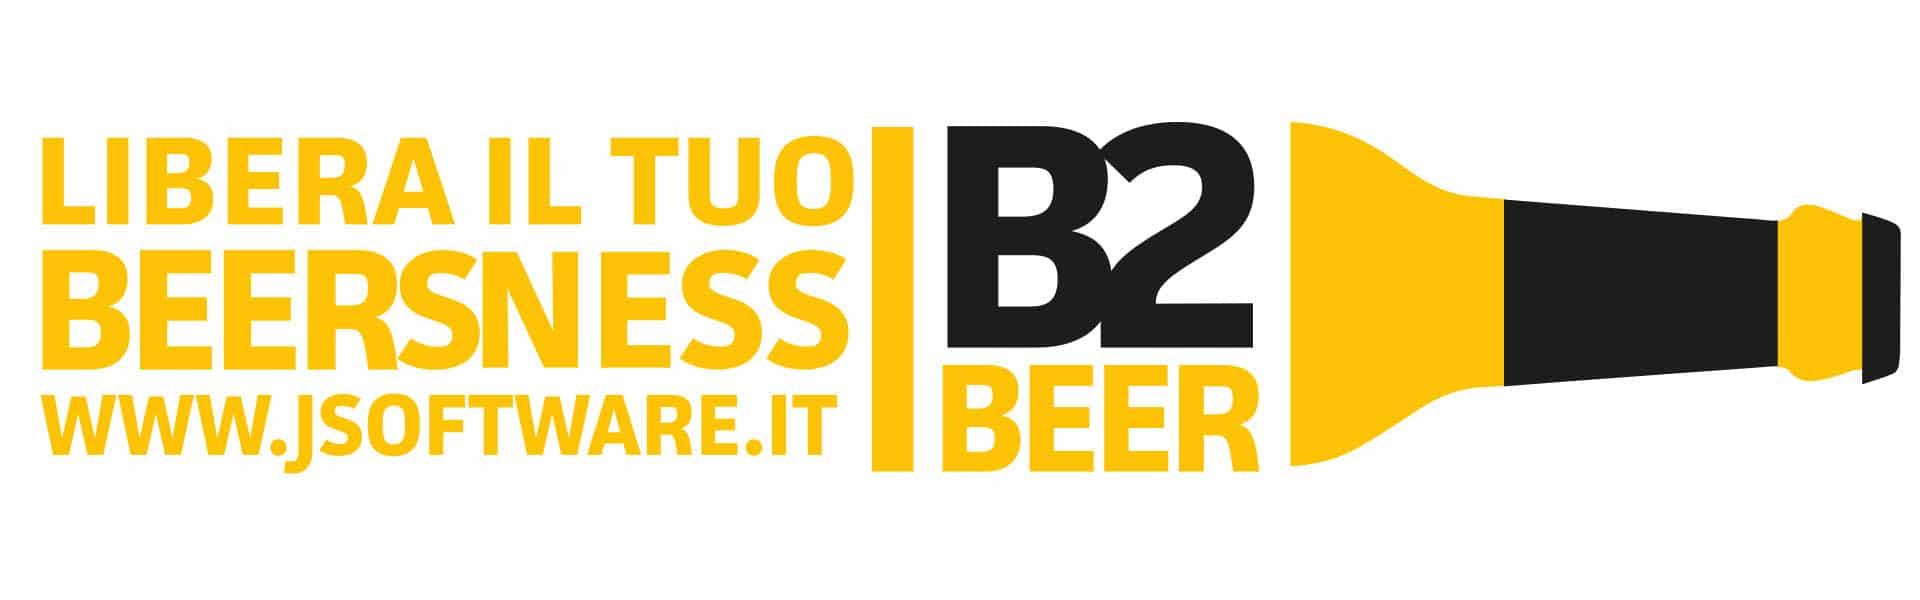 B2Beer, shop online b2b dedicato ai birrifici